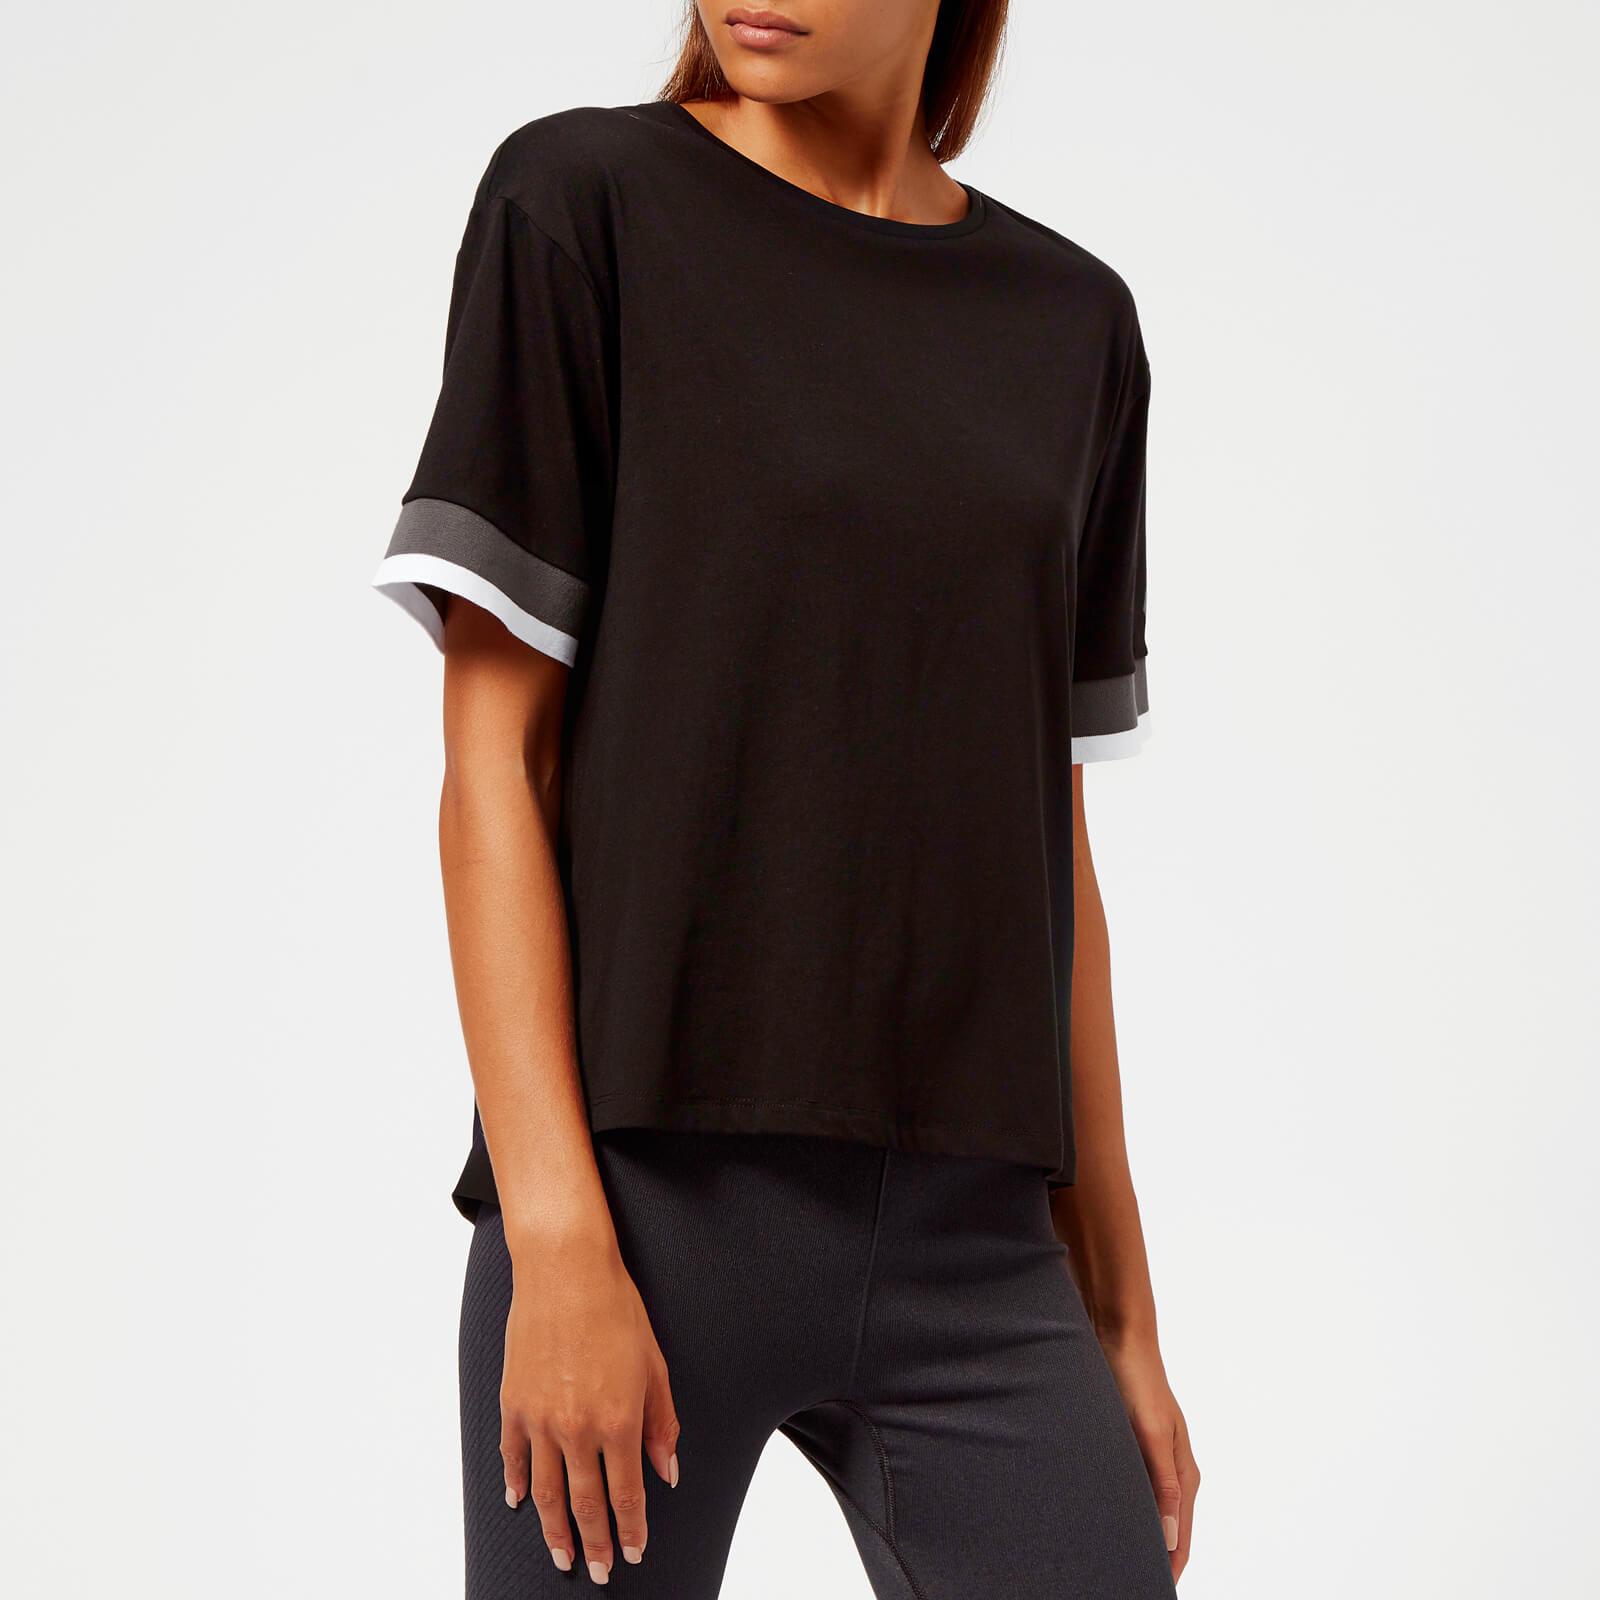 Asics Women's Mix Fabric Short Sleeve Top - Performance Black - XS - Black